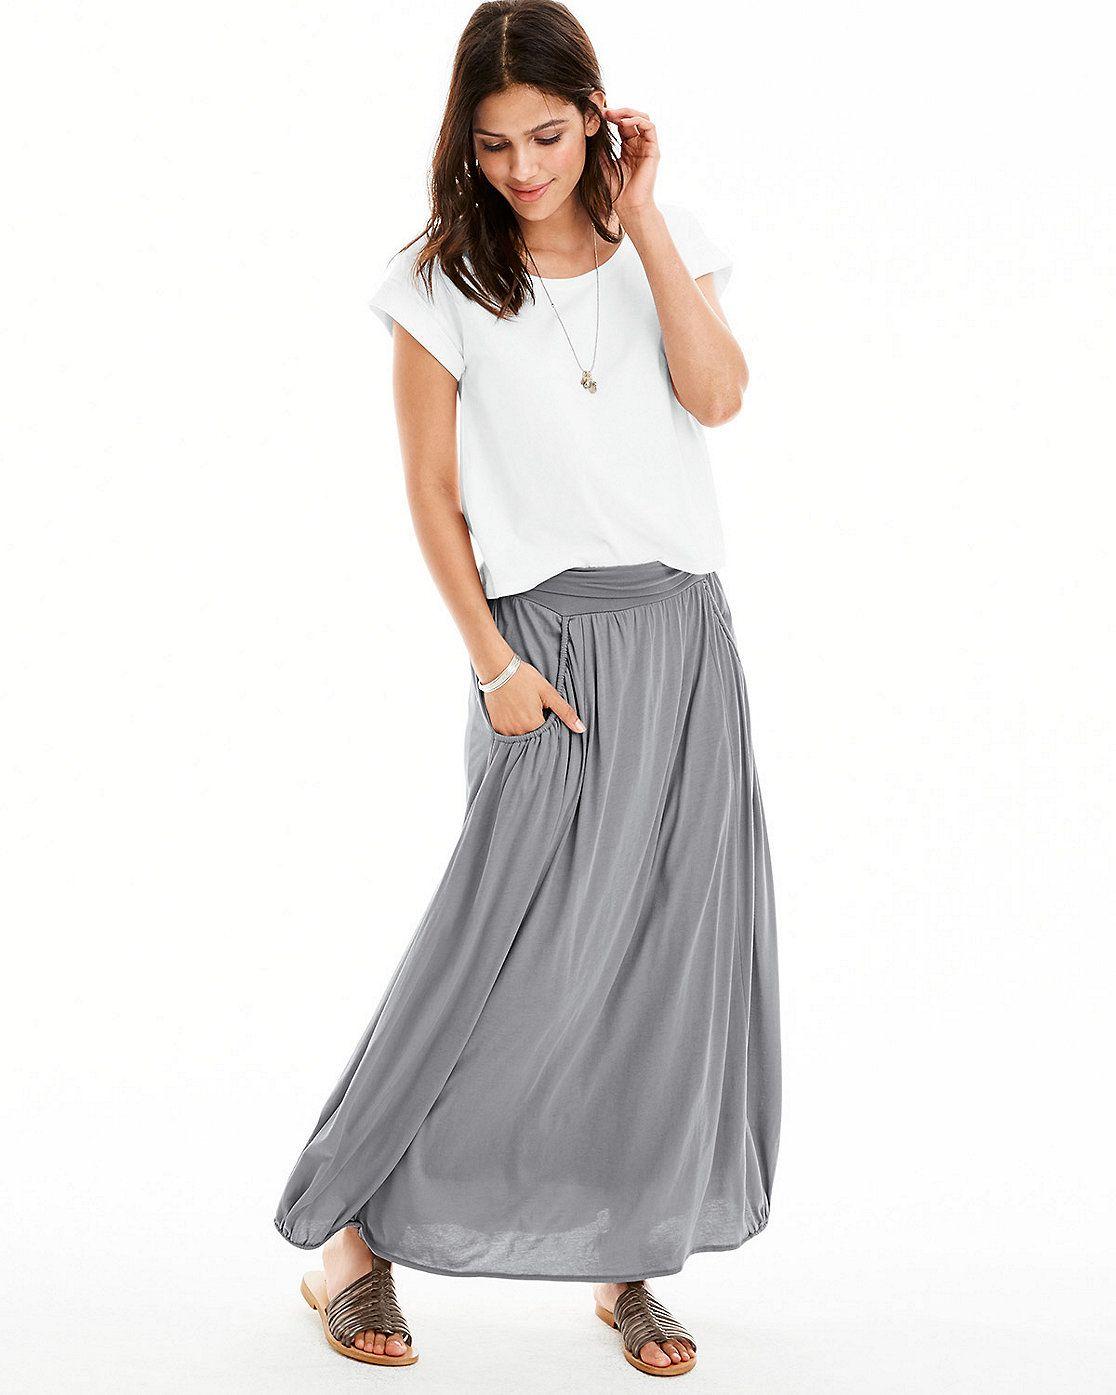 Hill Maxi Skirt Grey maxi skirts, Maxi skirt